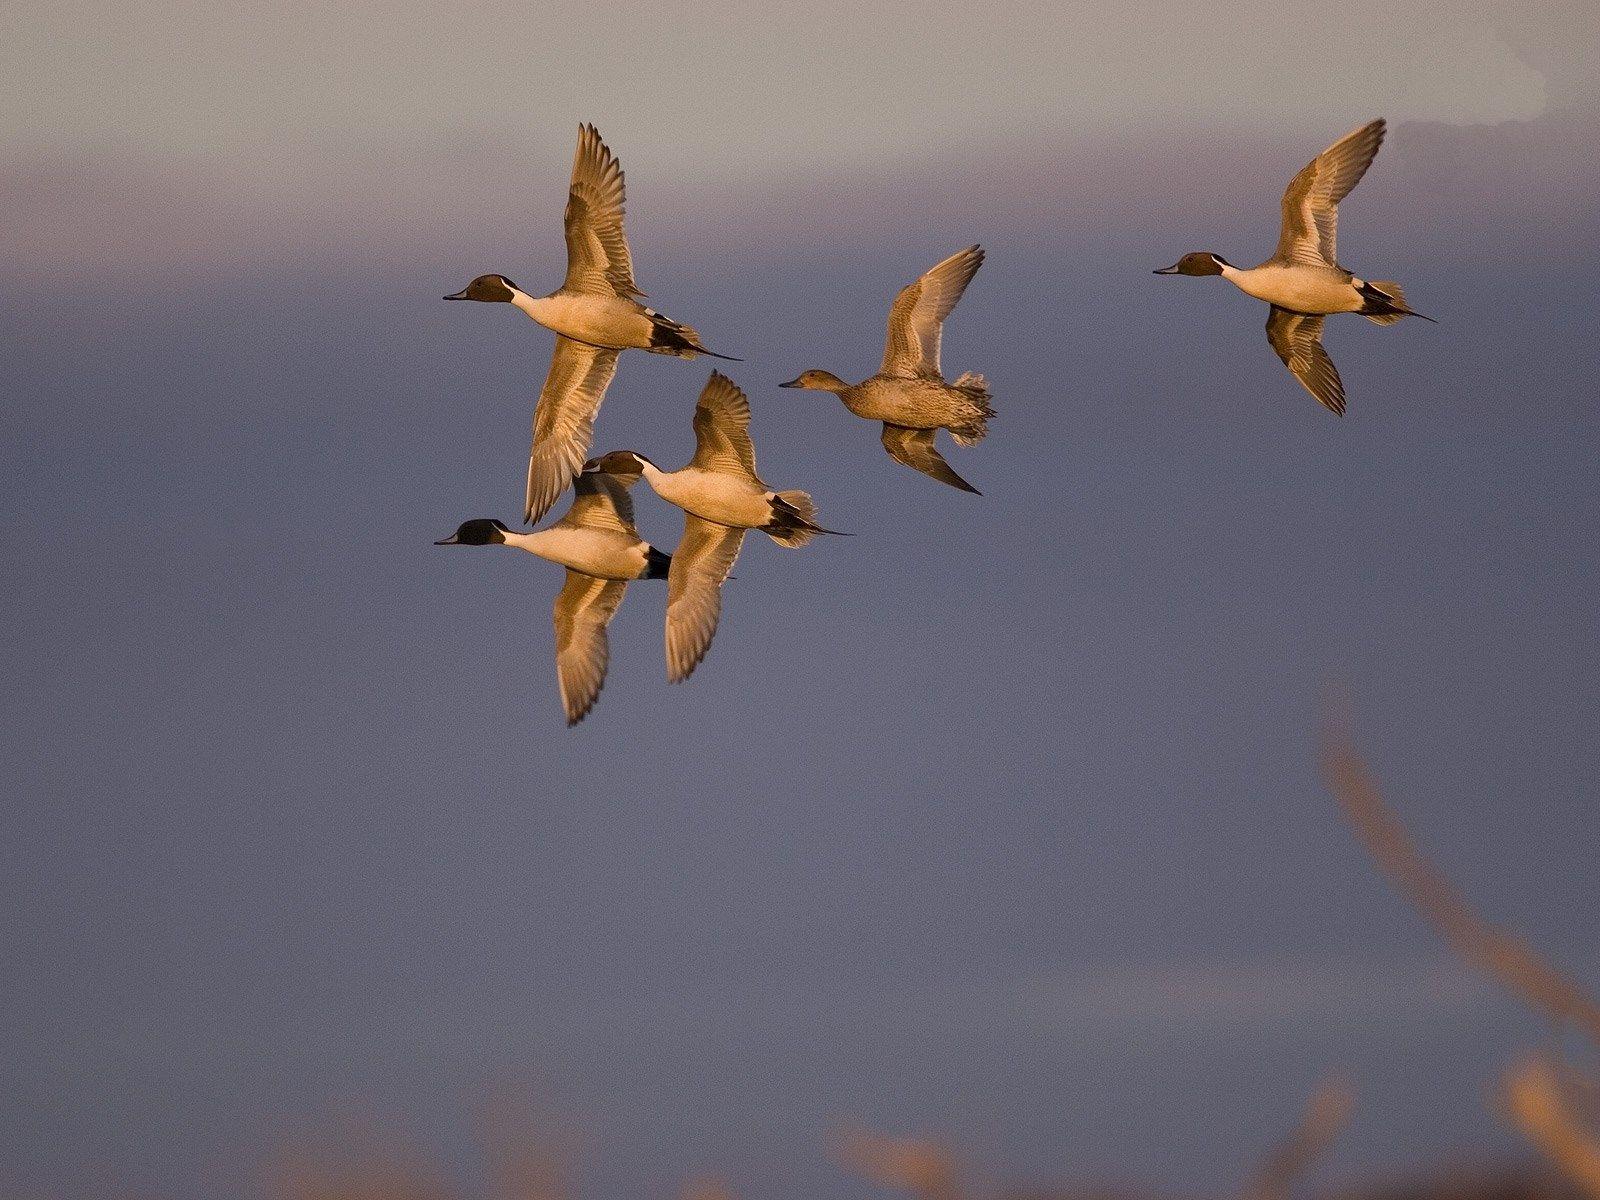 Duck Hunting Hd Wallpaper